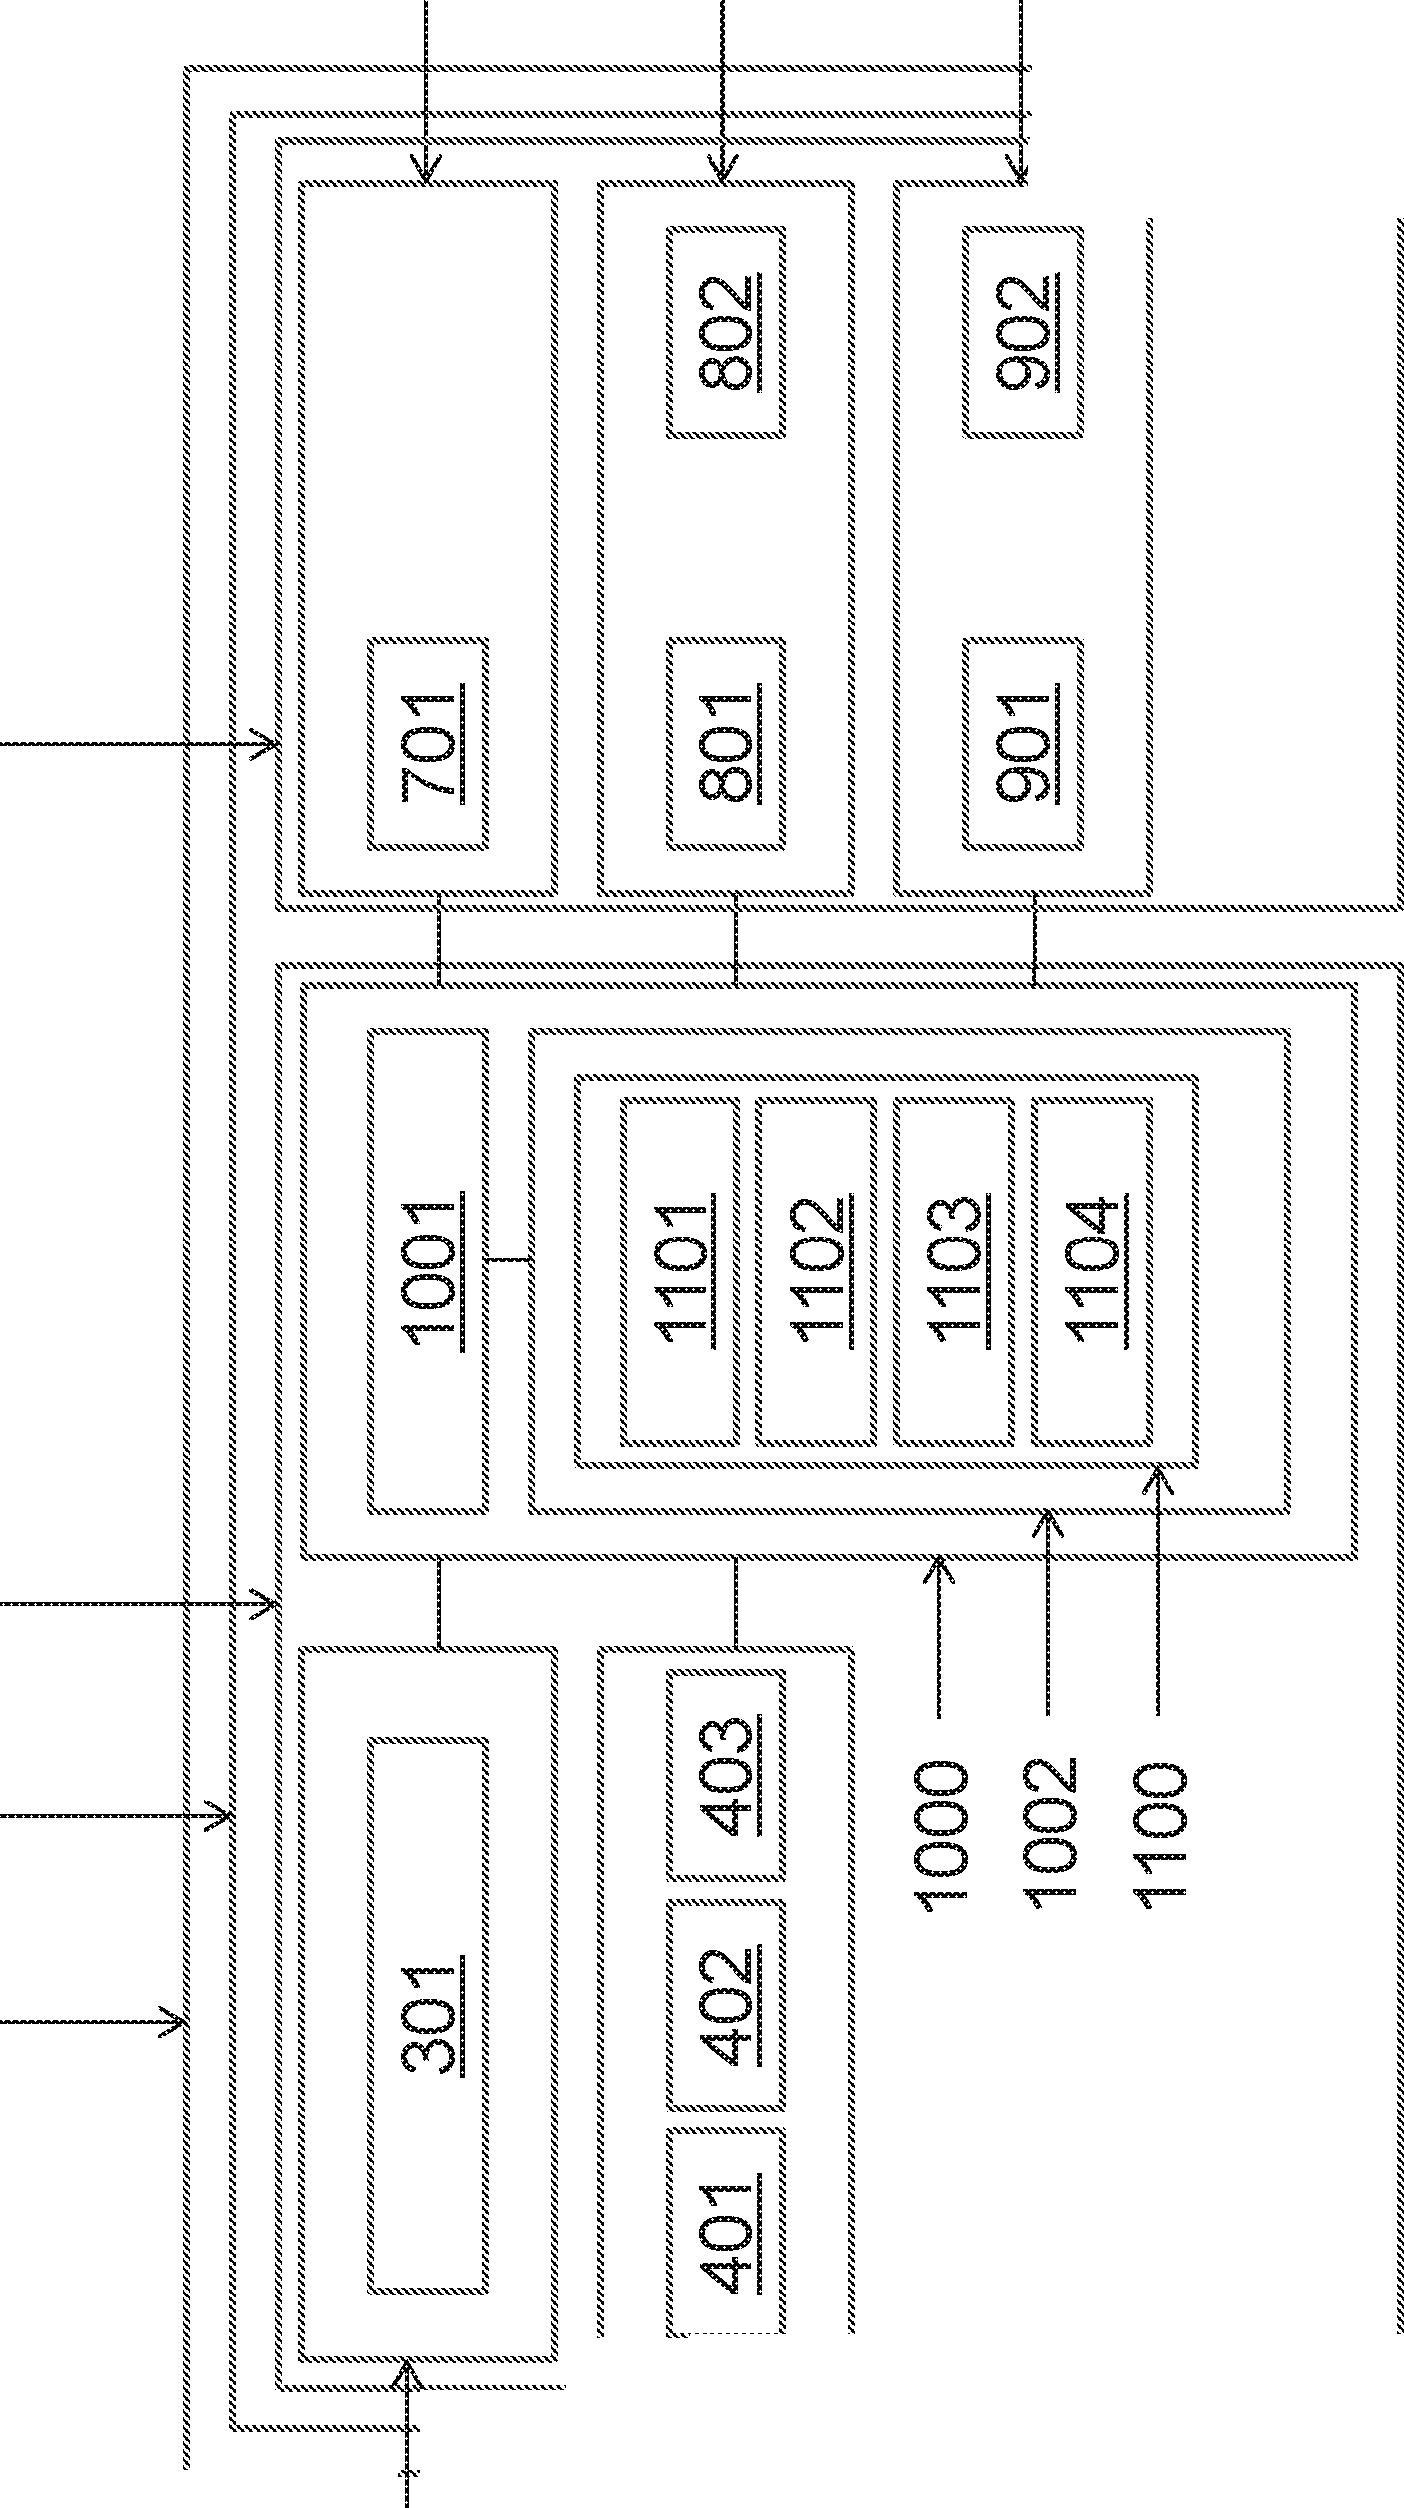 Figure GB2557237A_D0003